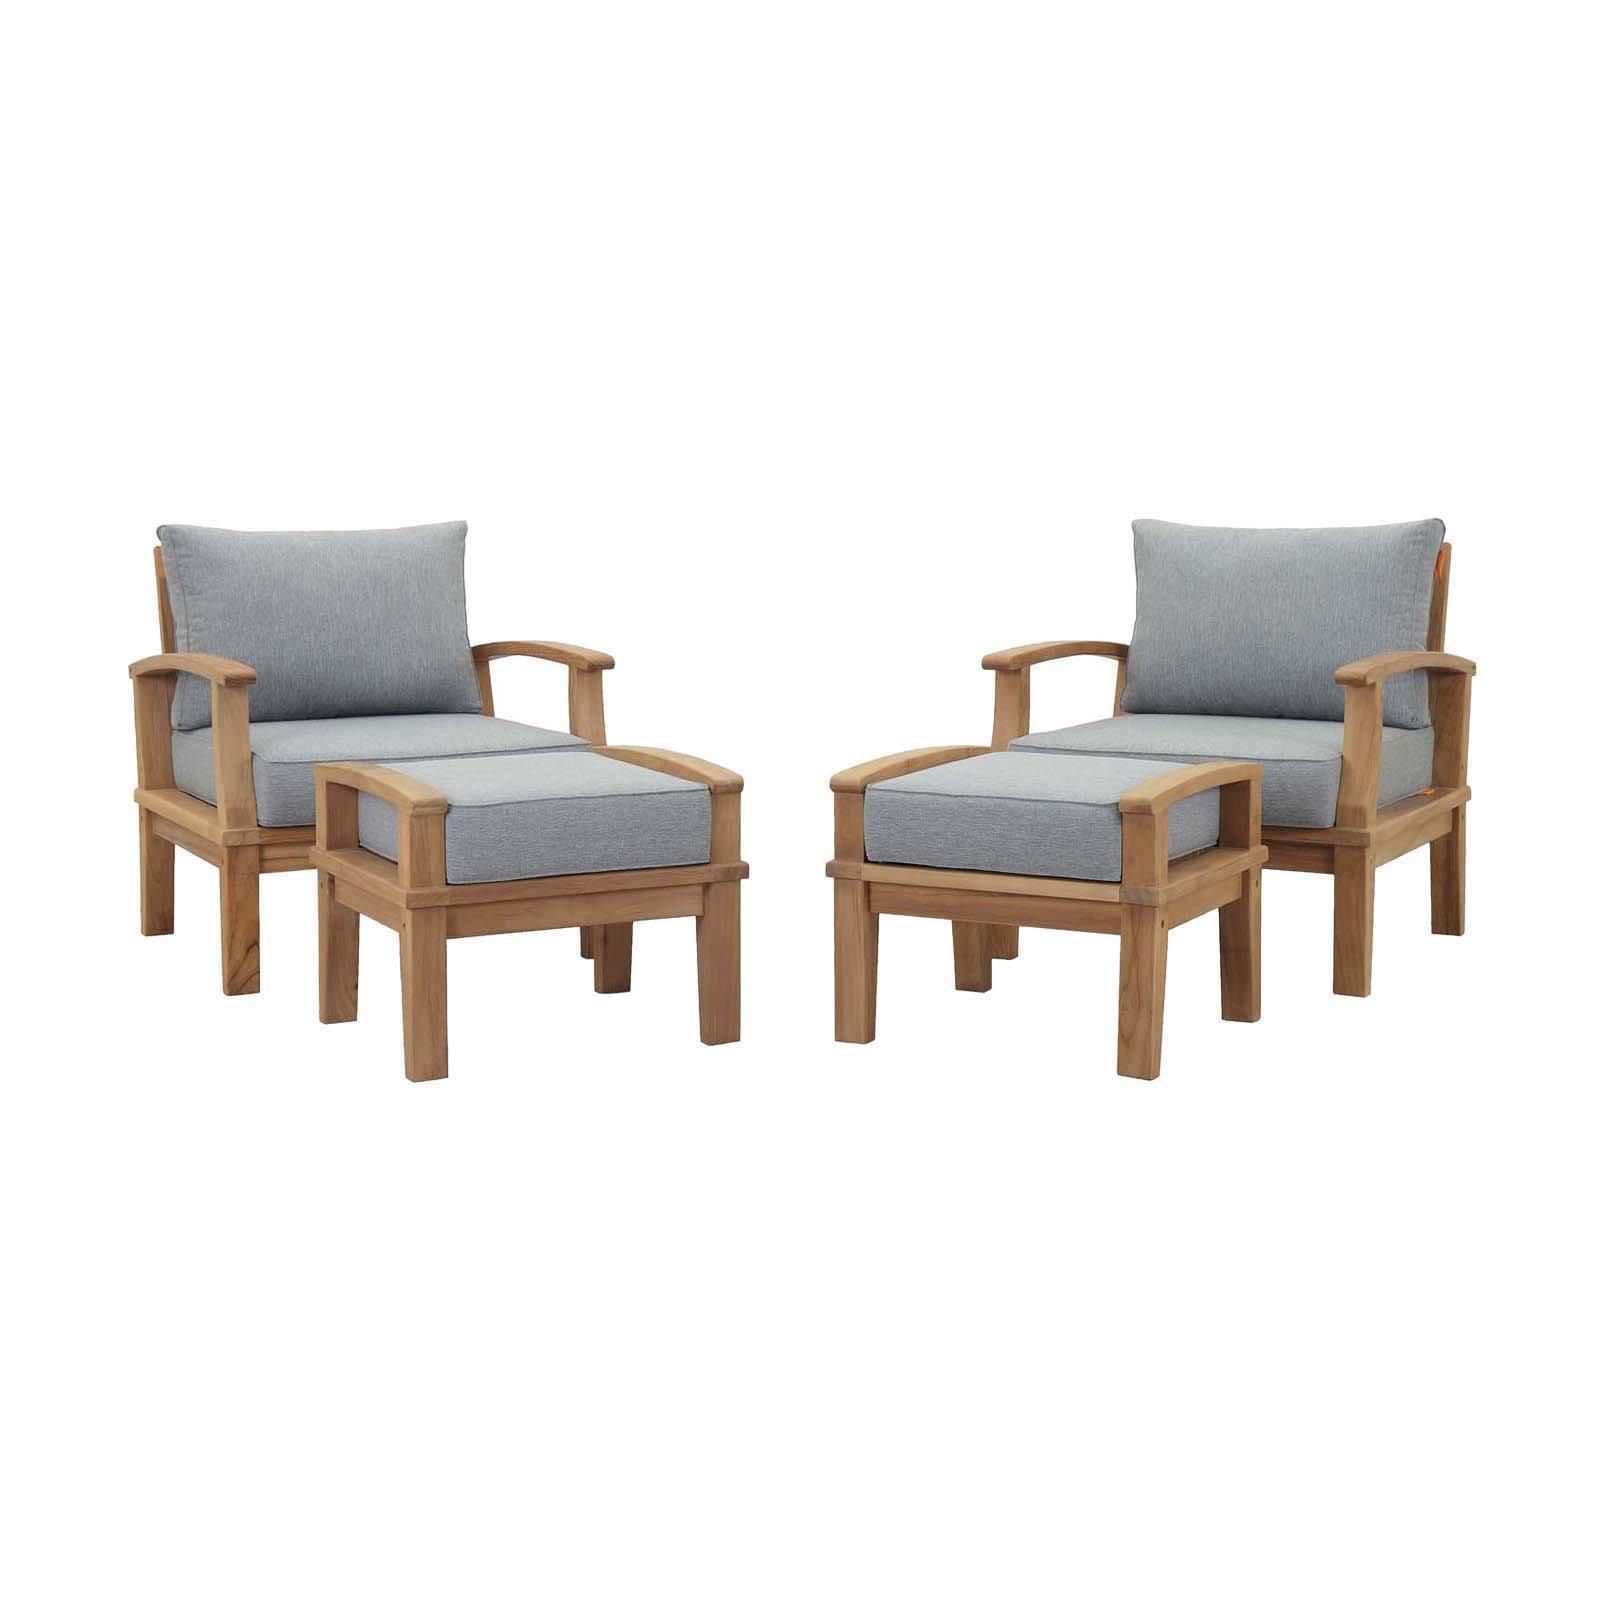 Modway Marina 4 Piece Outdoor Patio Teak Sofa Set in Natural White